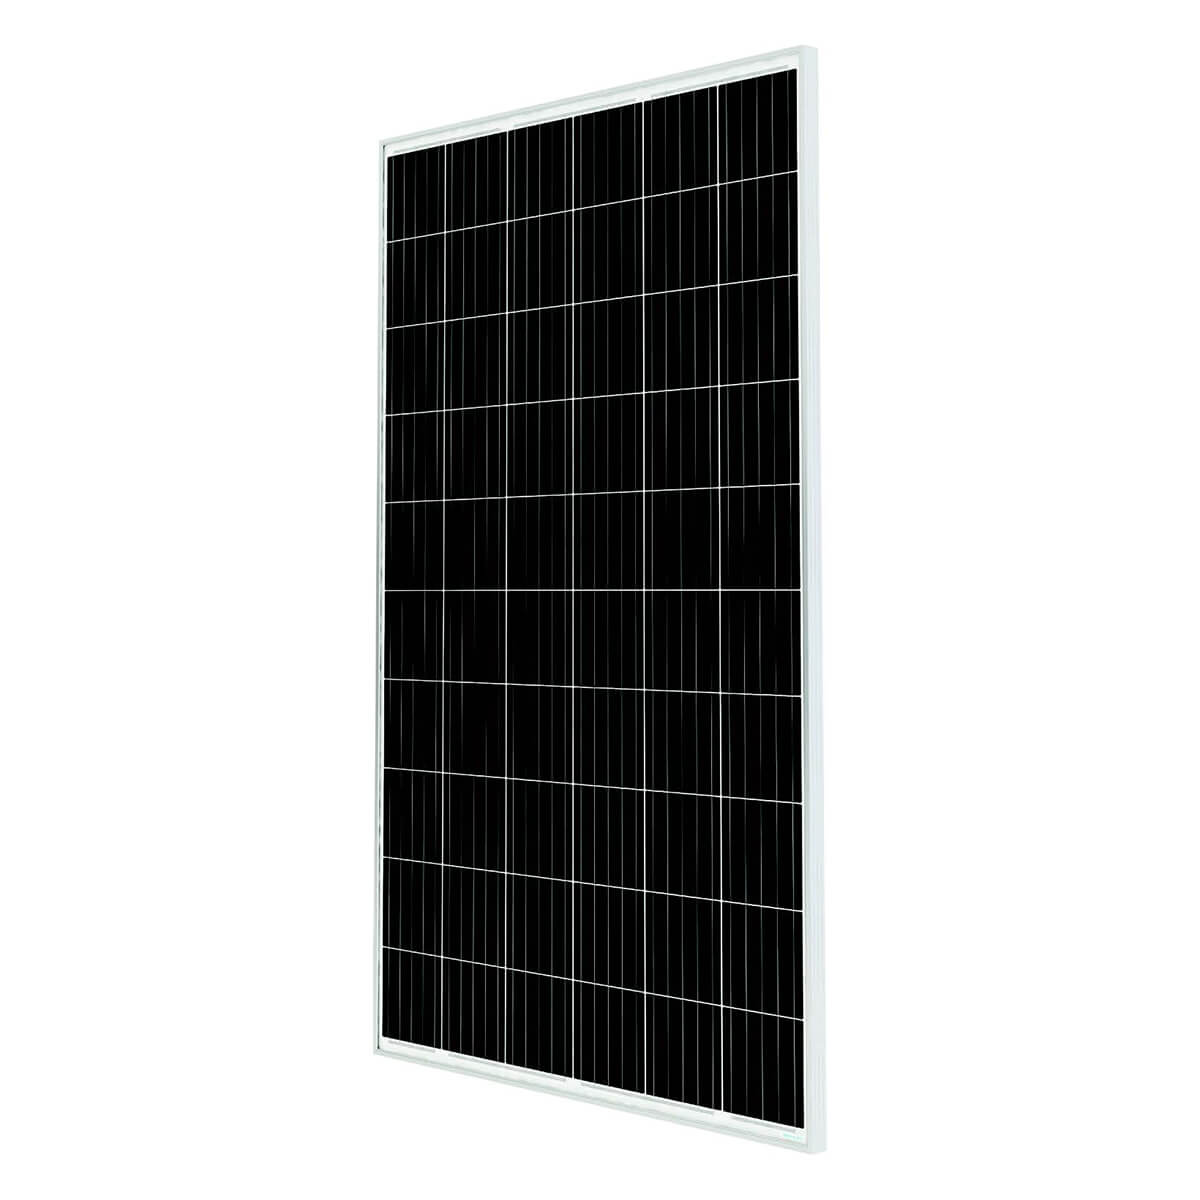 cw enerji 330W panel, cw enerji 330Watt panel, cw enerji 330 W panel, cw enerji 330 Watt panel, cw enerji 330 Watt monokristal panel, cw enerji 330 W watt gunes paneli, cw enerji 330 W watt monokristal gunes paneli, cw enerji 330 W Watt fotovoltaik monokristal solar panel, cw enerji 330W monokristal gunes enerjisi, cw enerji CWT330-60PM-330 panel, CW Enerji 330 WATT